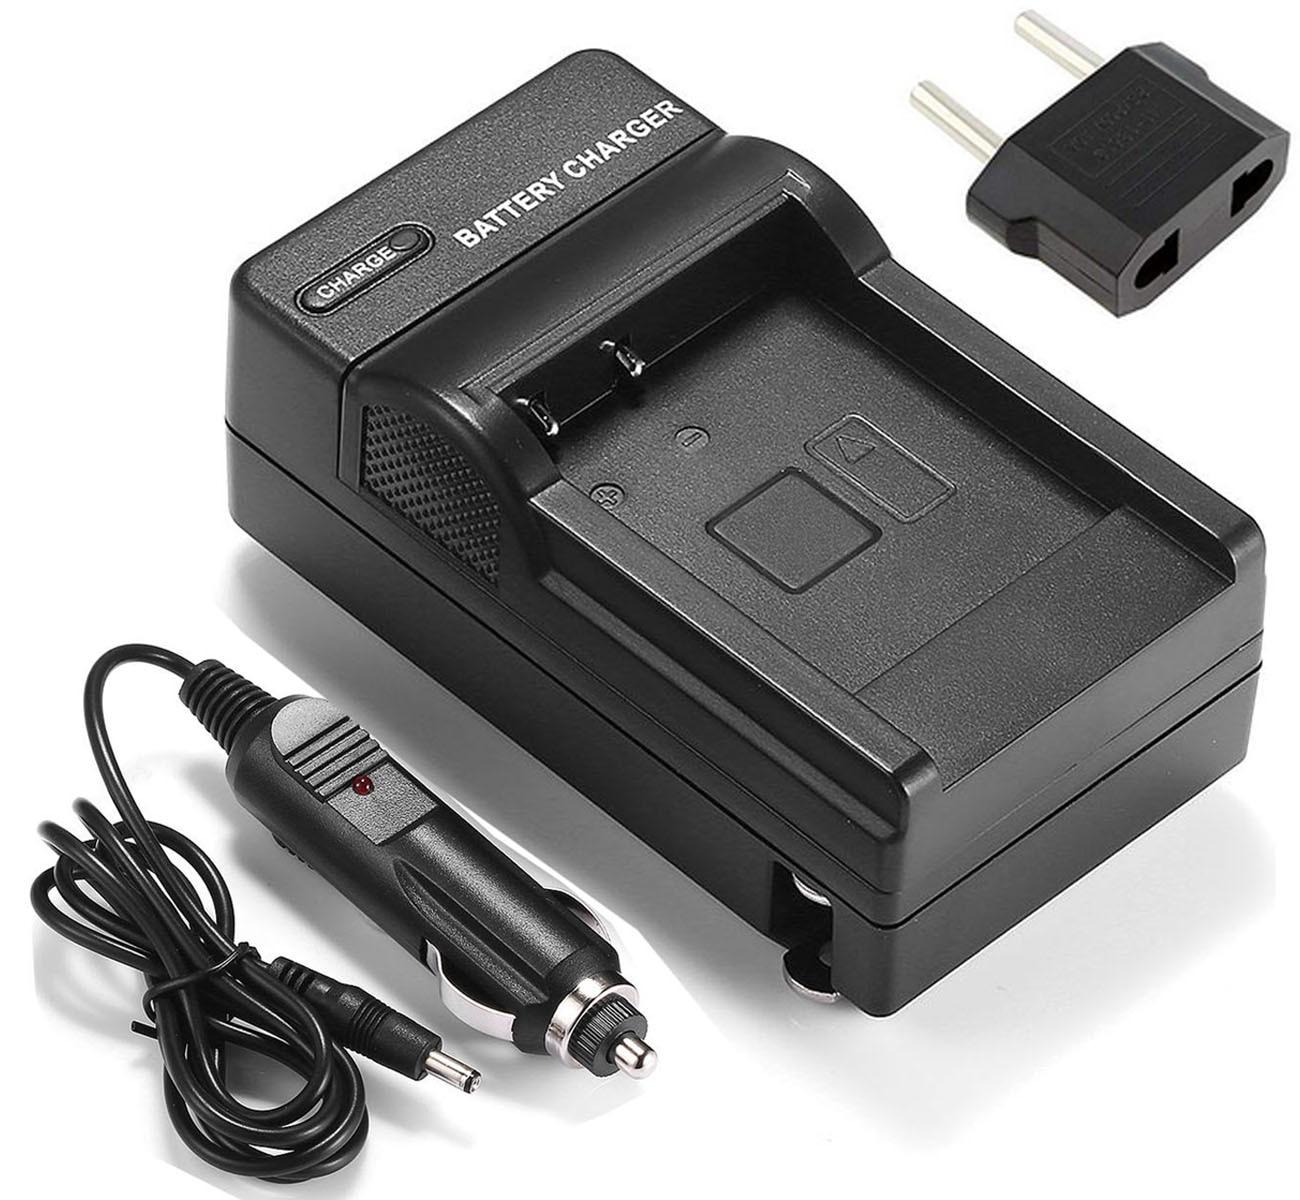 Carregador de bateria para fujifilm xe1, xe2, X-E2S, xe3, xh1, xm1, xt1, xt2, xt3, xt10, xt20, xt30, xt100 câmera digital